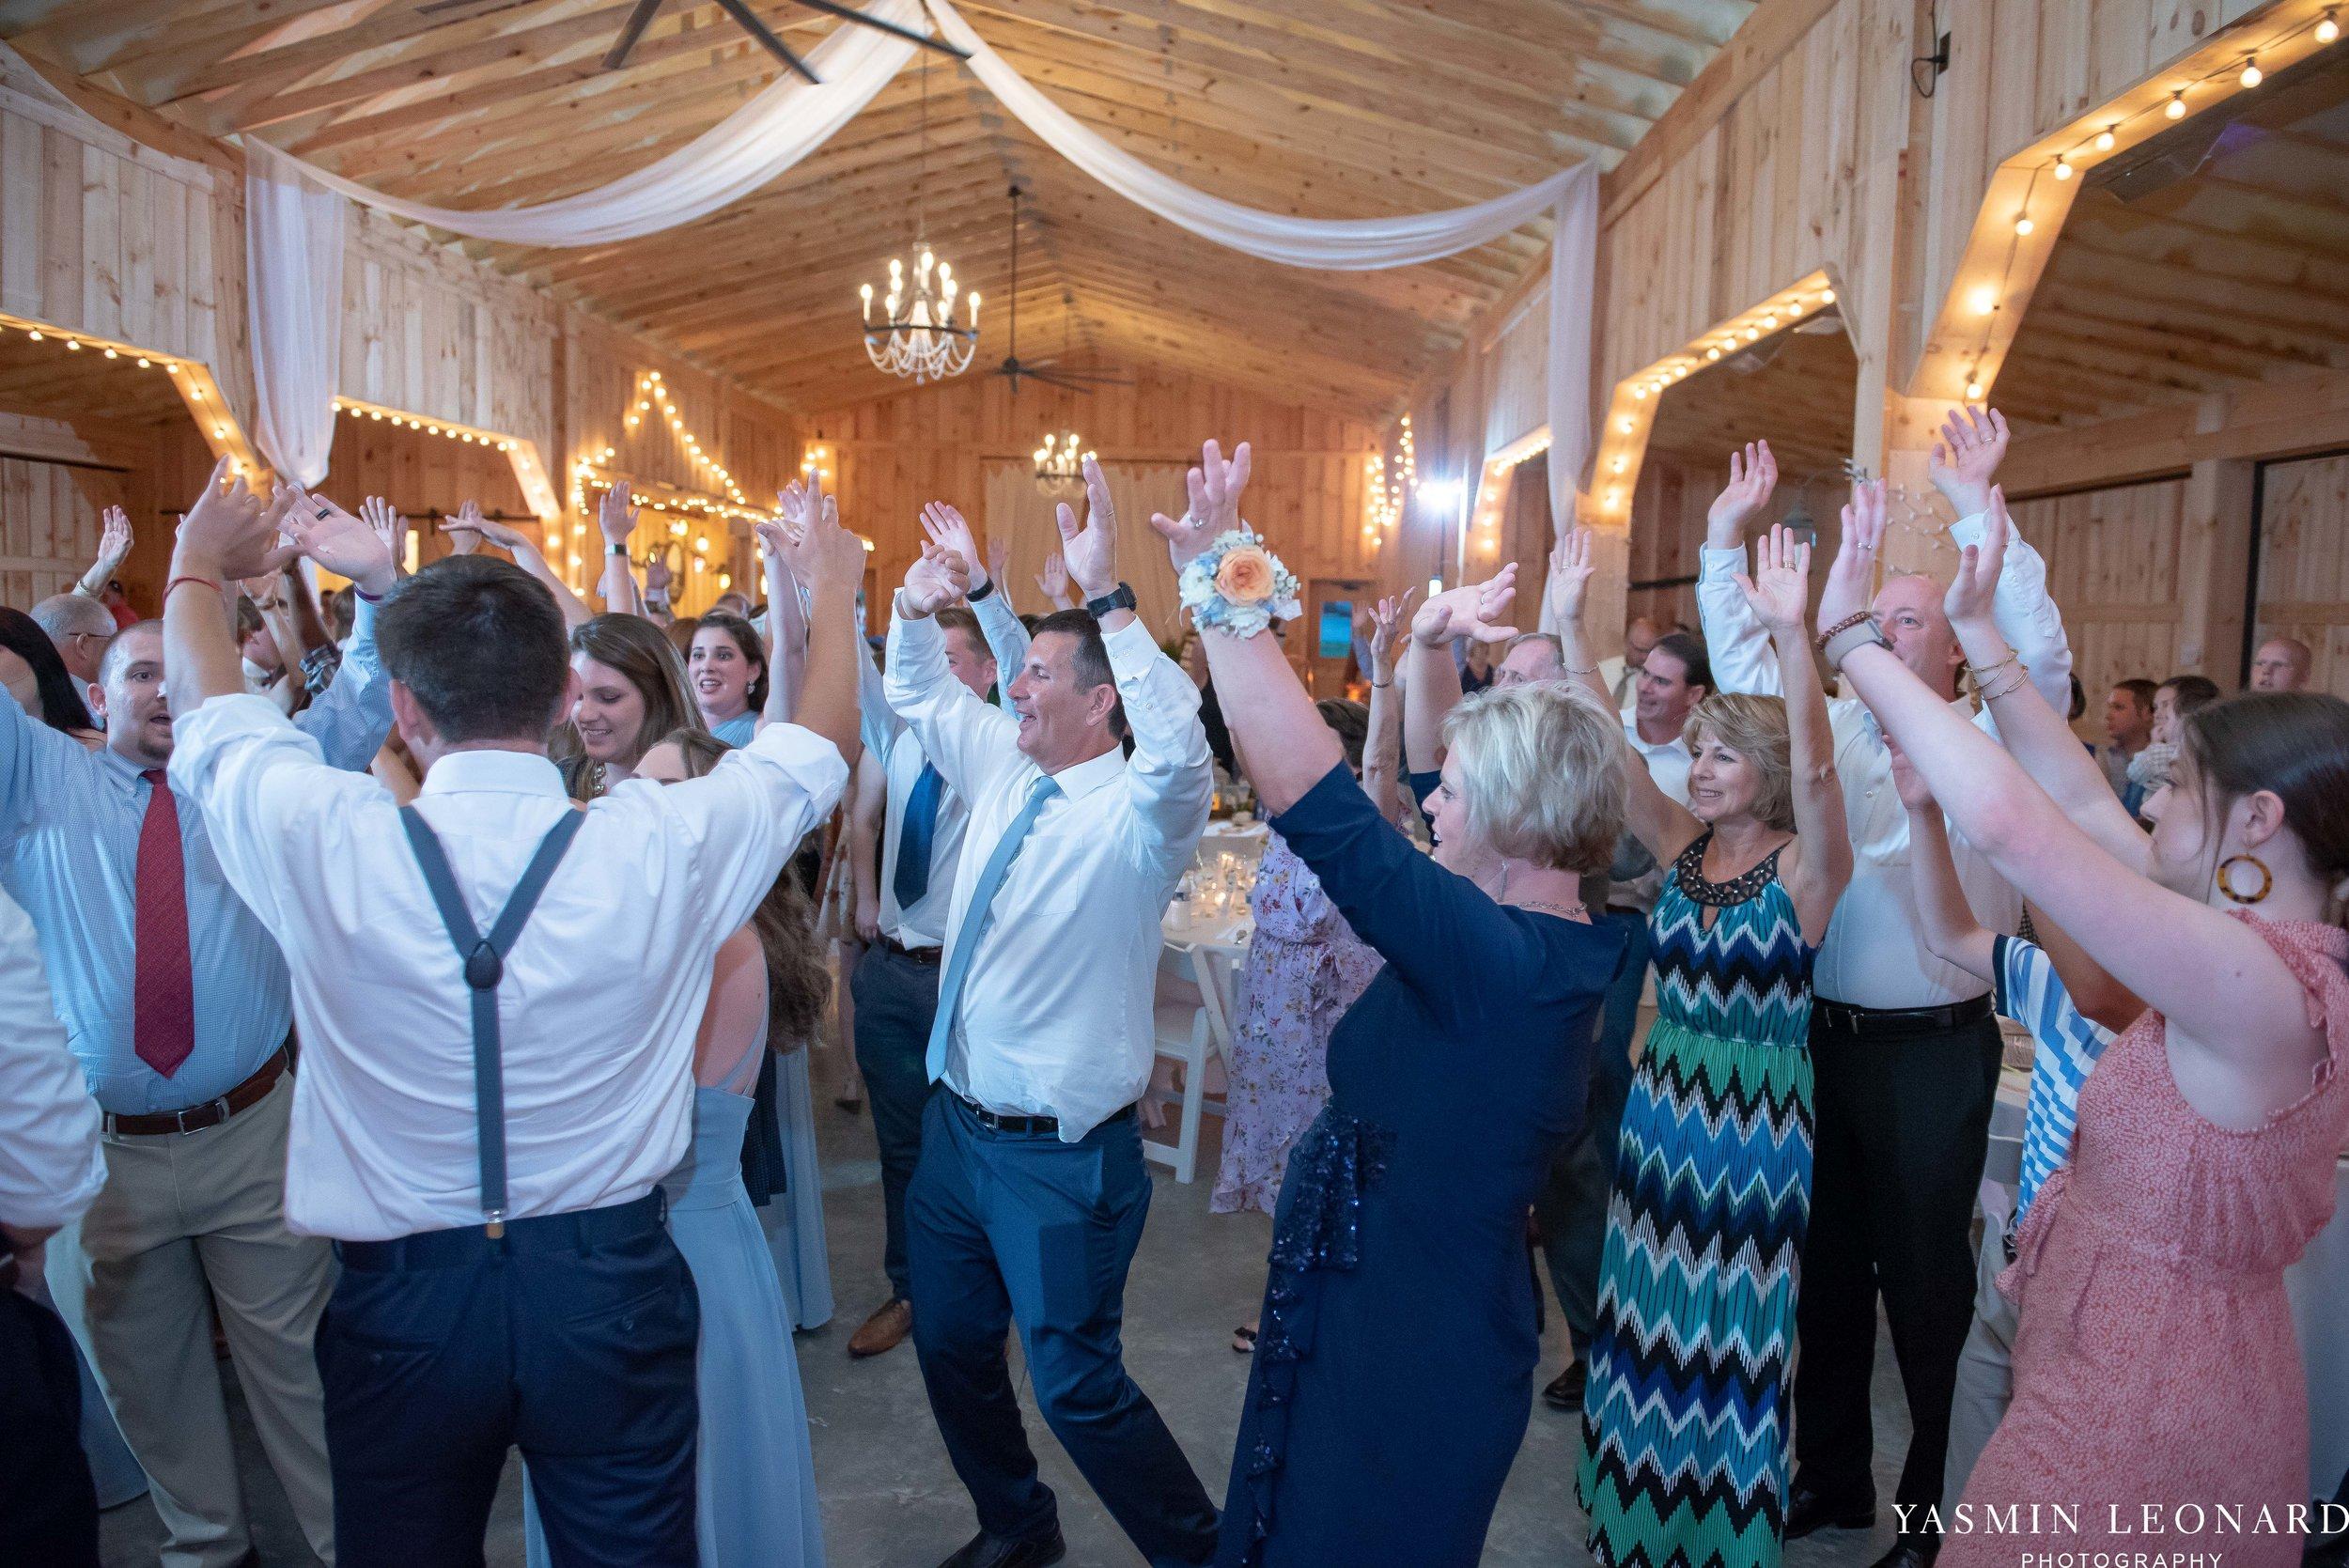 Old Homeplace Vineyard - NC Weddings - Outdoor Summer Weddings - Peony Boutique - Vineyard Wedding - NC Photographer - Yasmin Leonard Photography-76.jpg